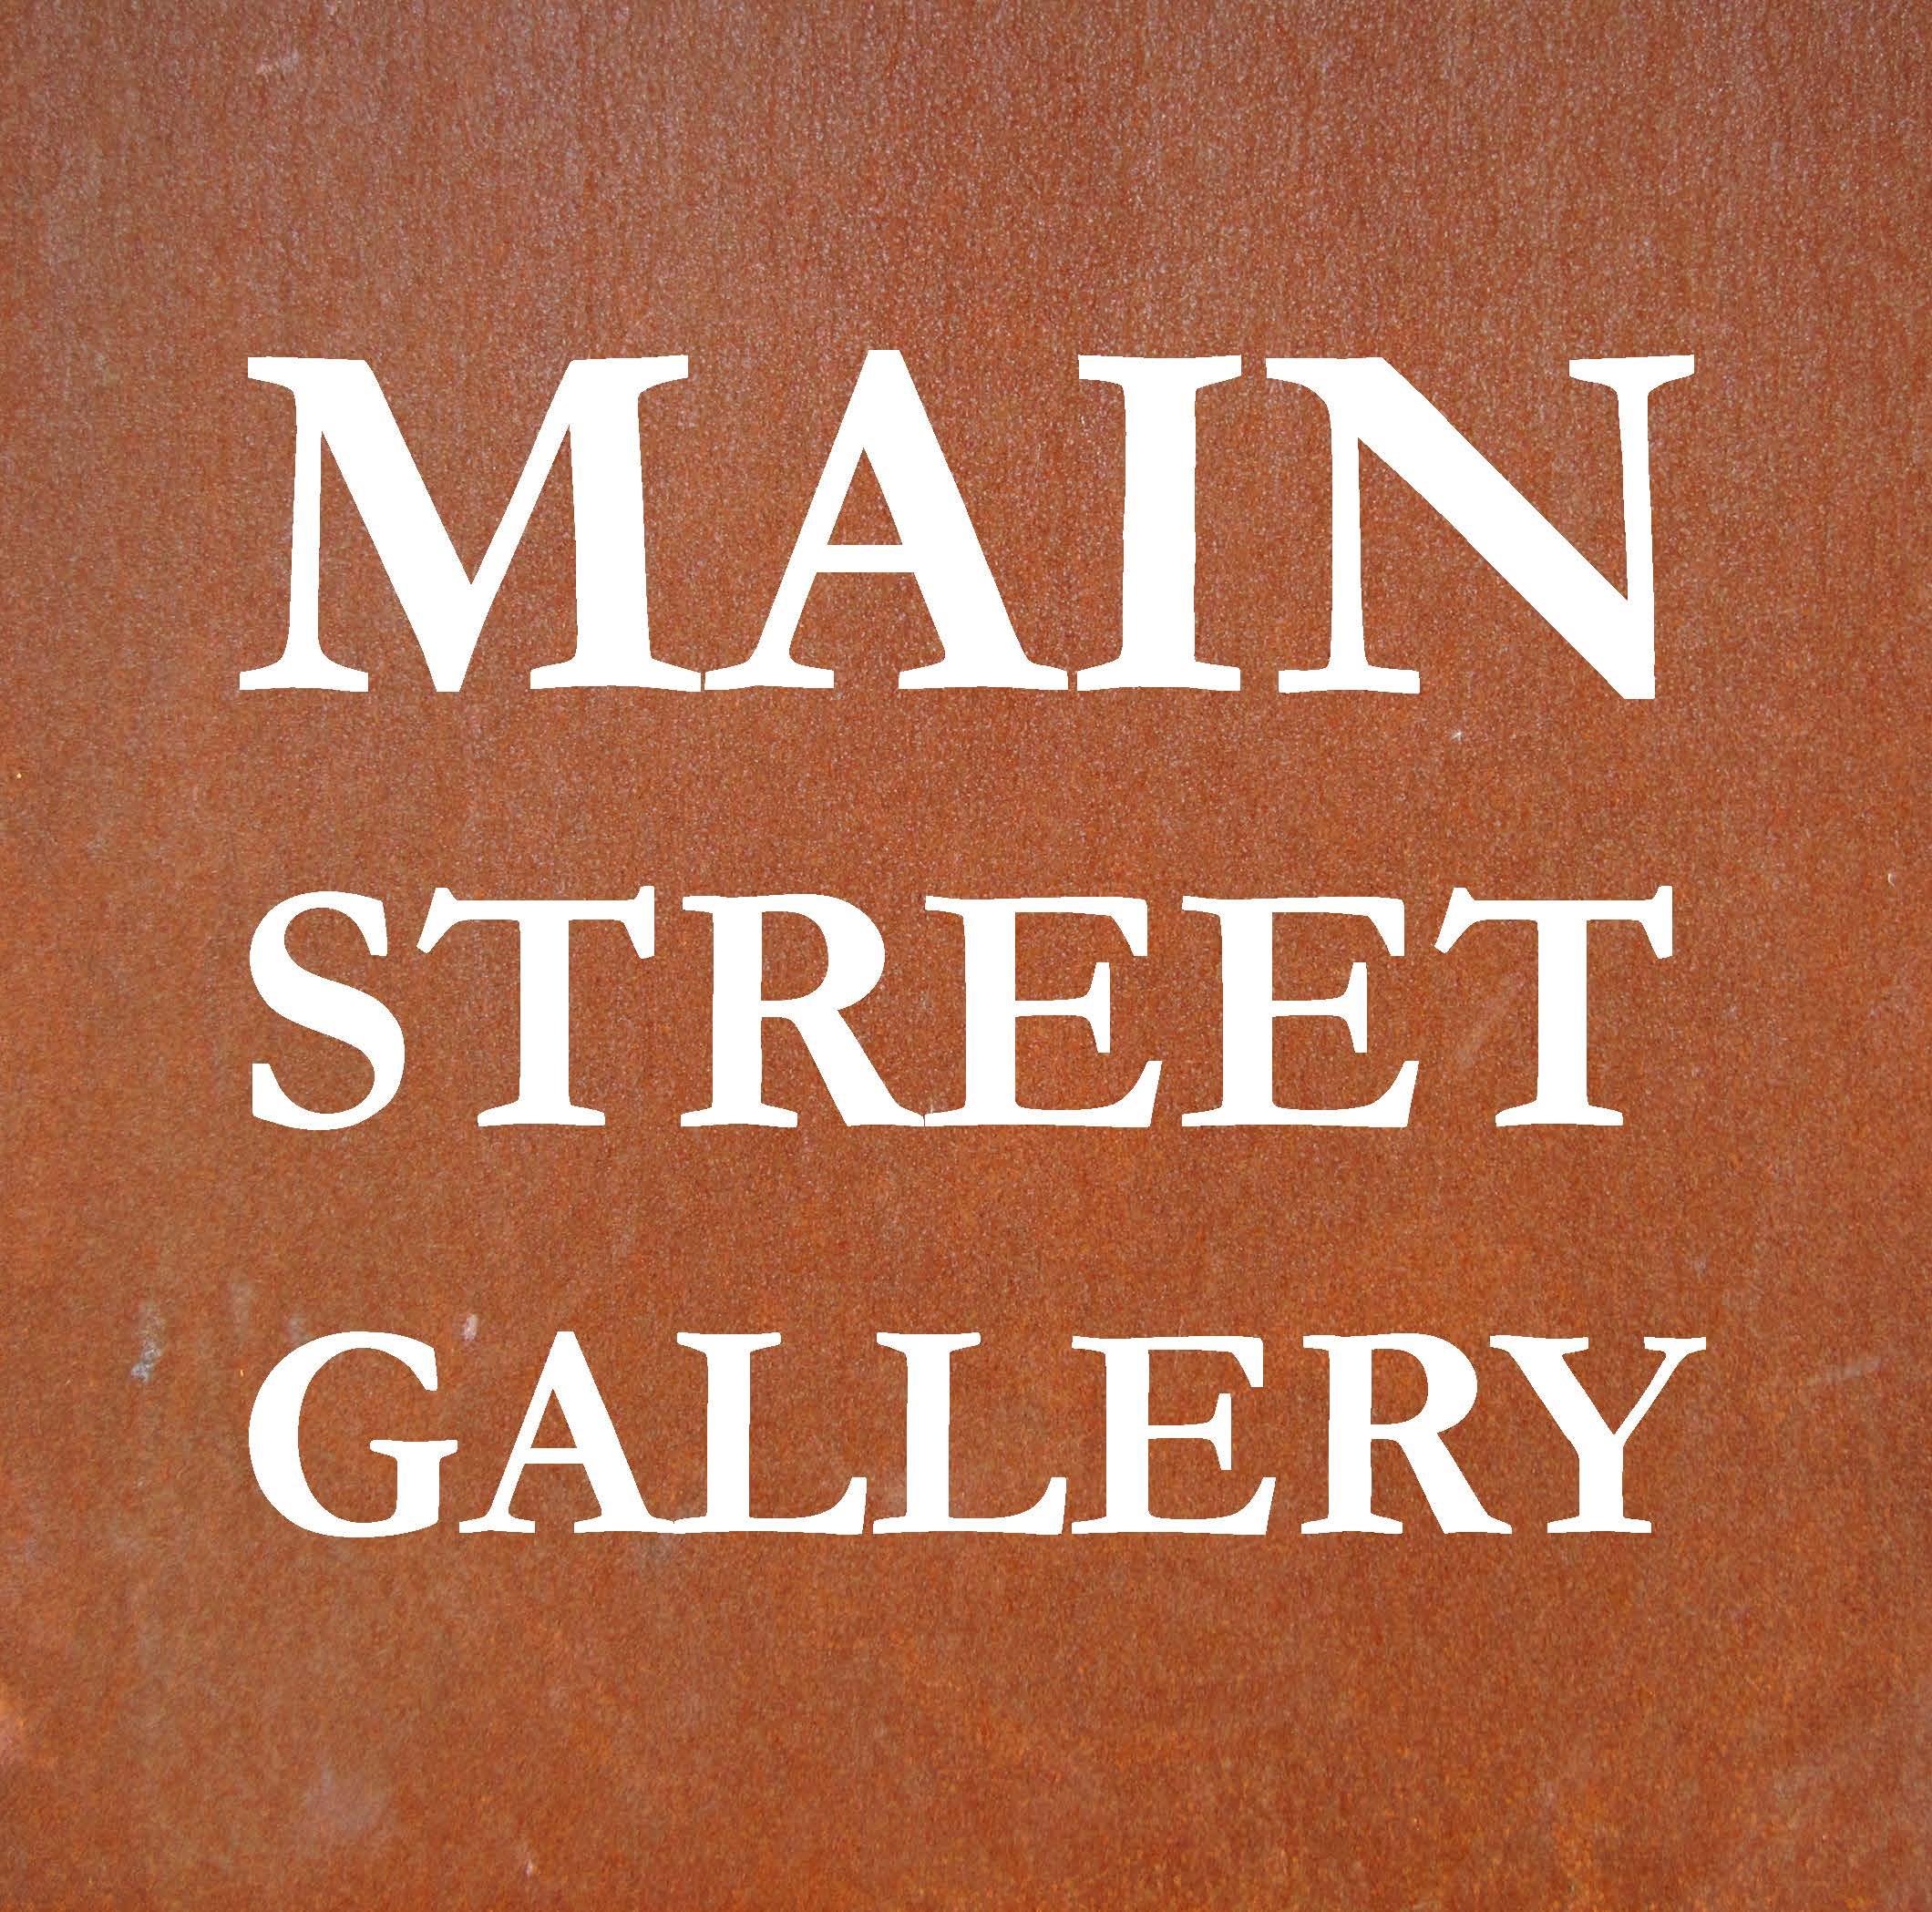 Main Street Gallery CLOSED